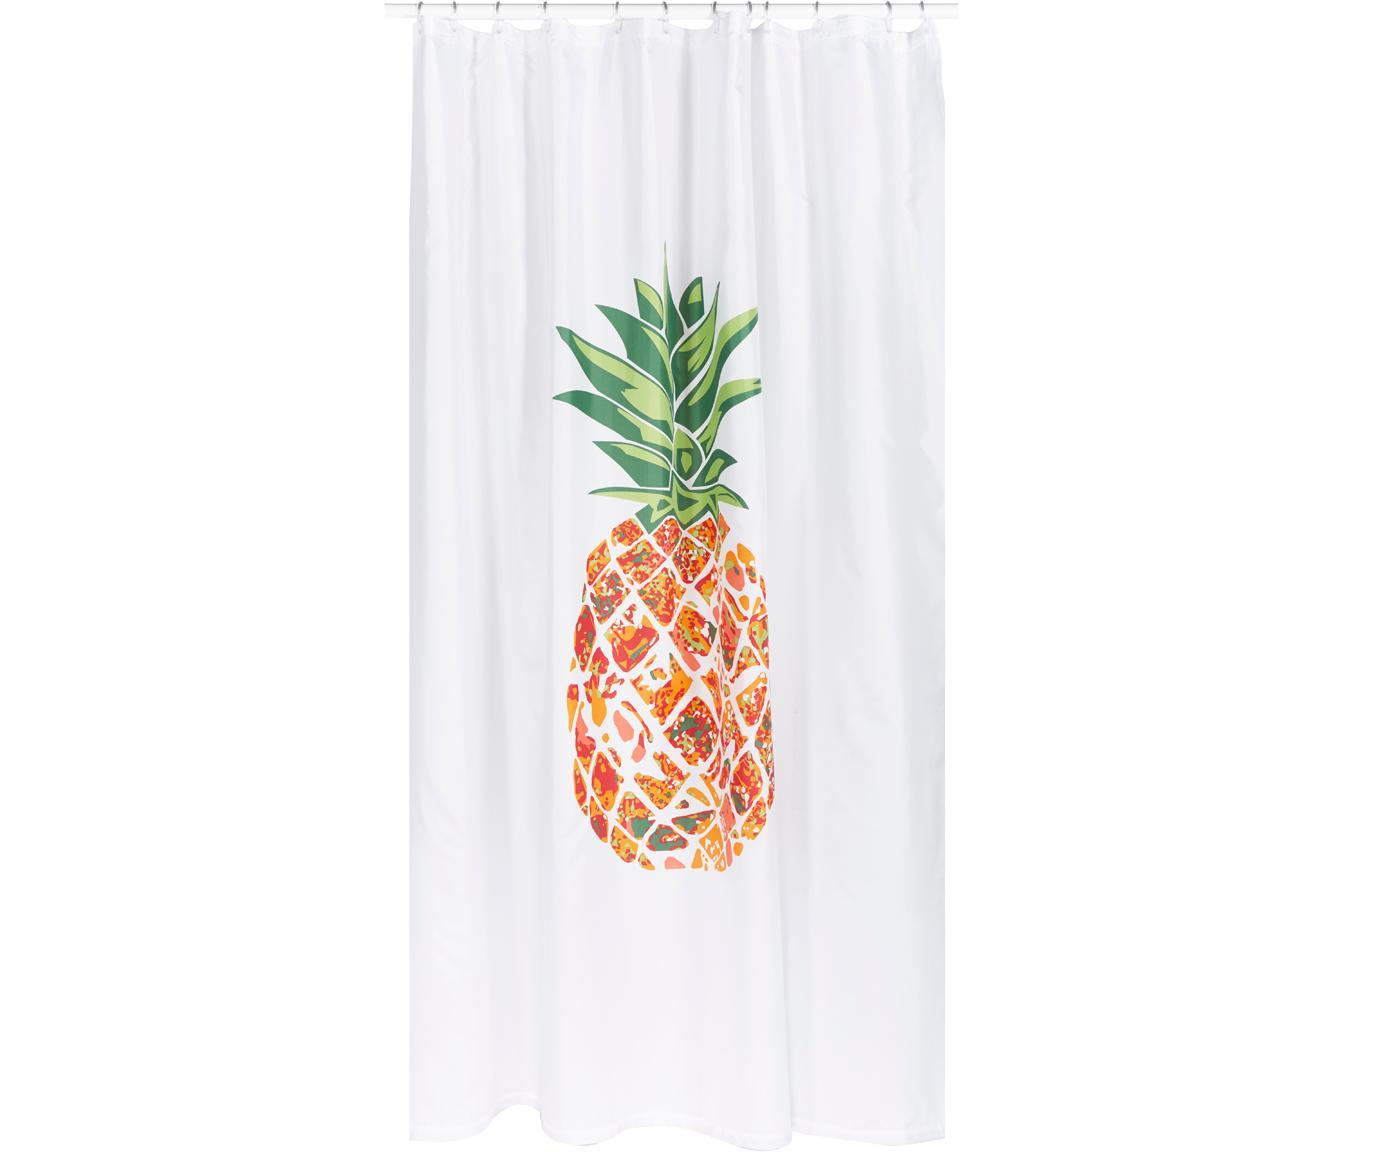 Cortina de baño Pineapple, Poliéster Repelente al agua, no impermeable, Blanco, verde, naranja, rojo, An 180 x L 200 cm